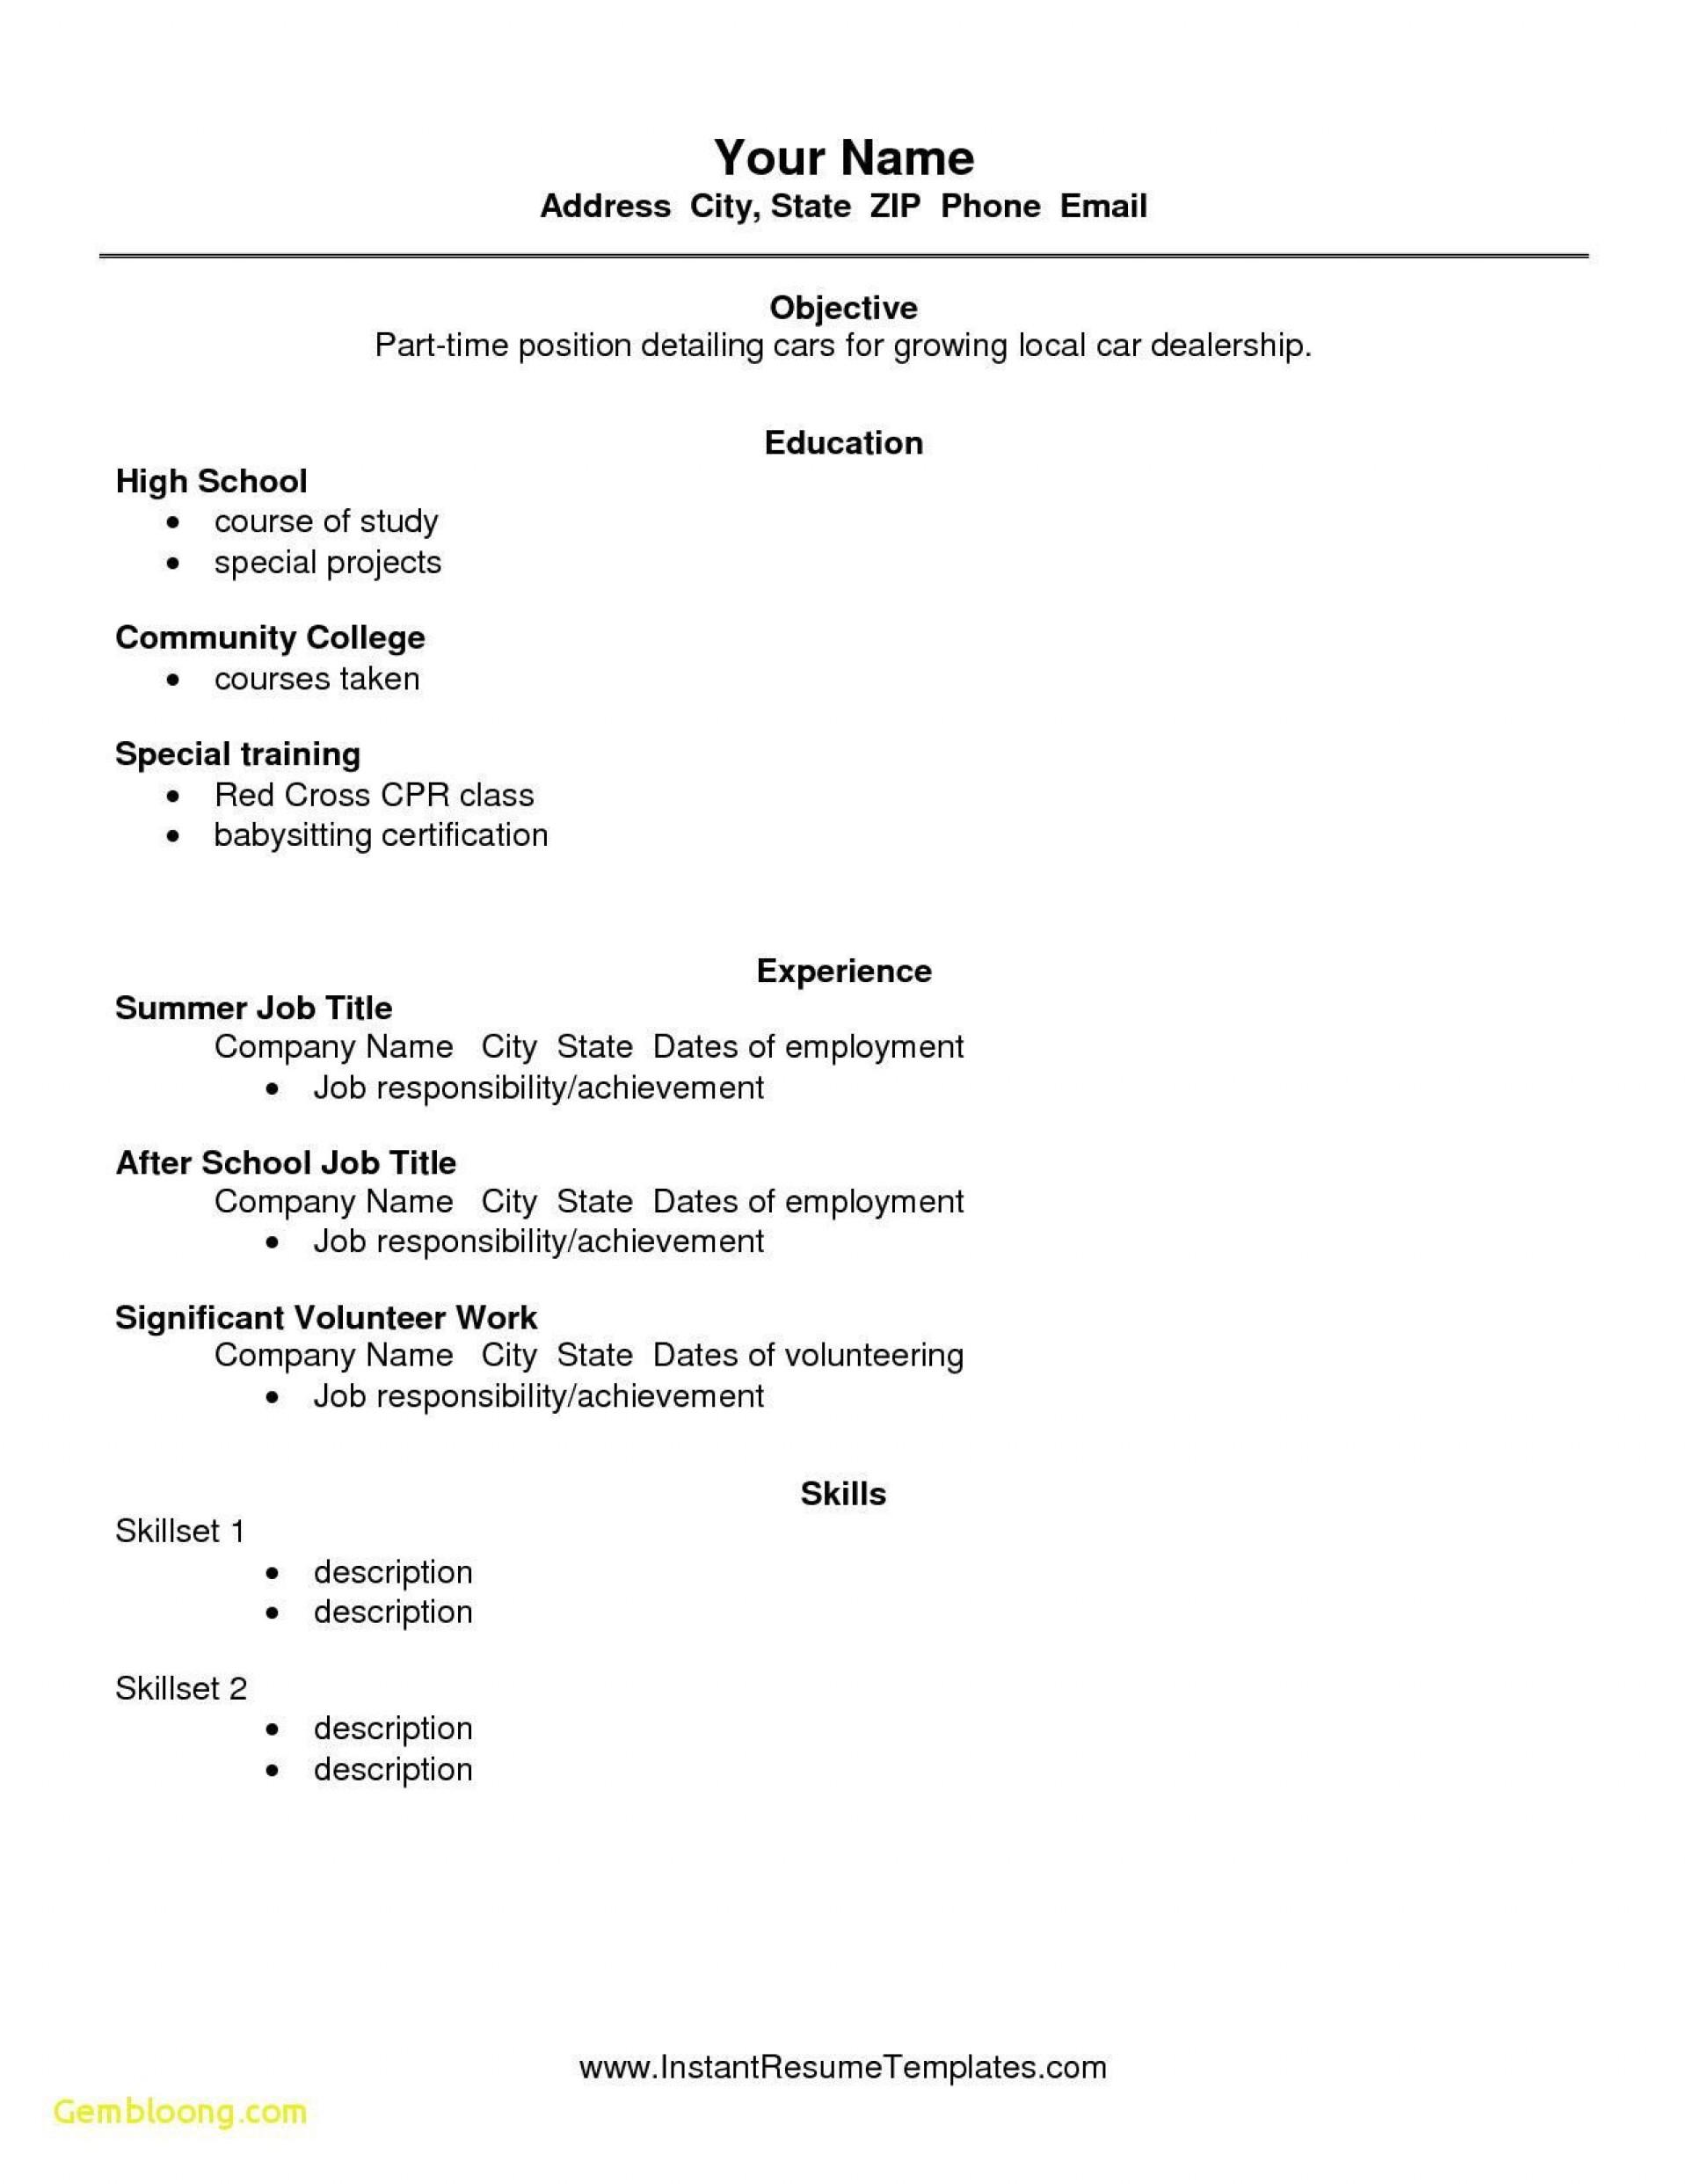 002 Impressive Free High School Resume Template Microsoft Word Highest Clarity 1920